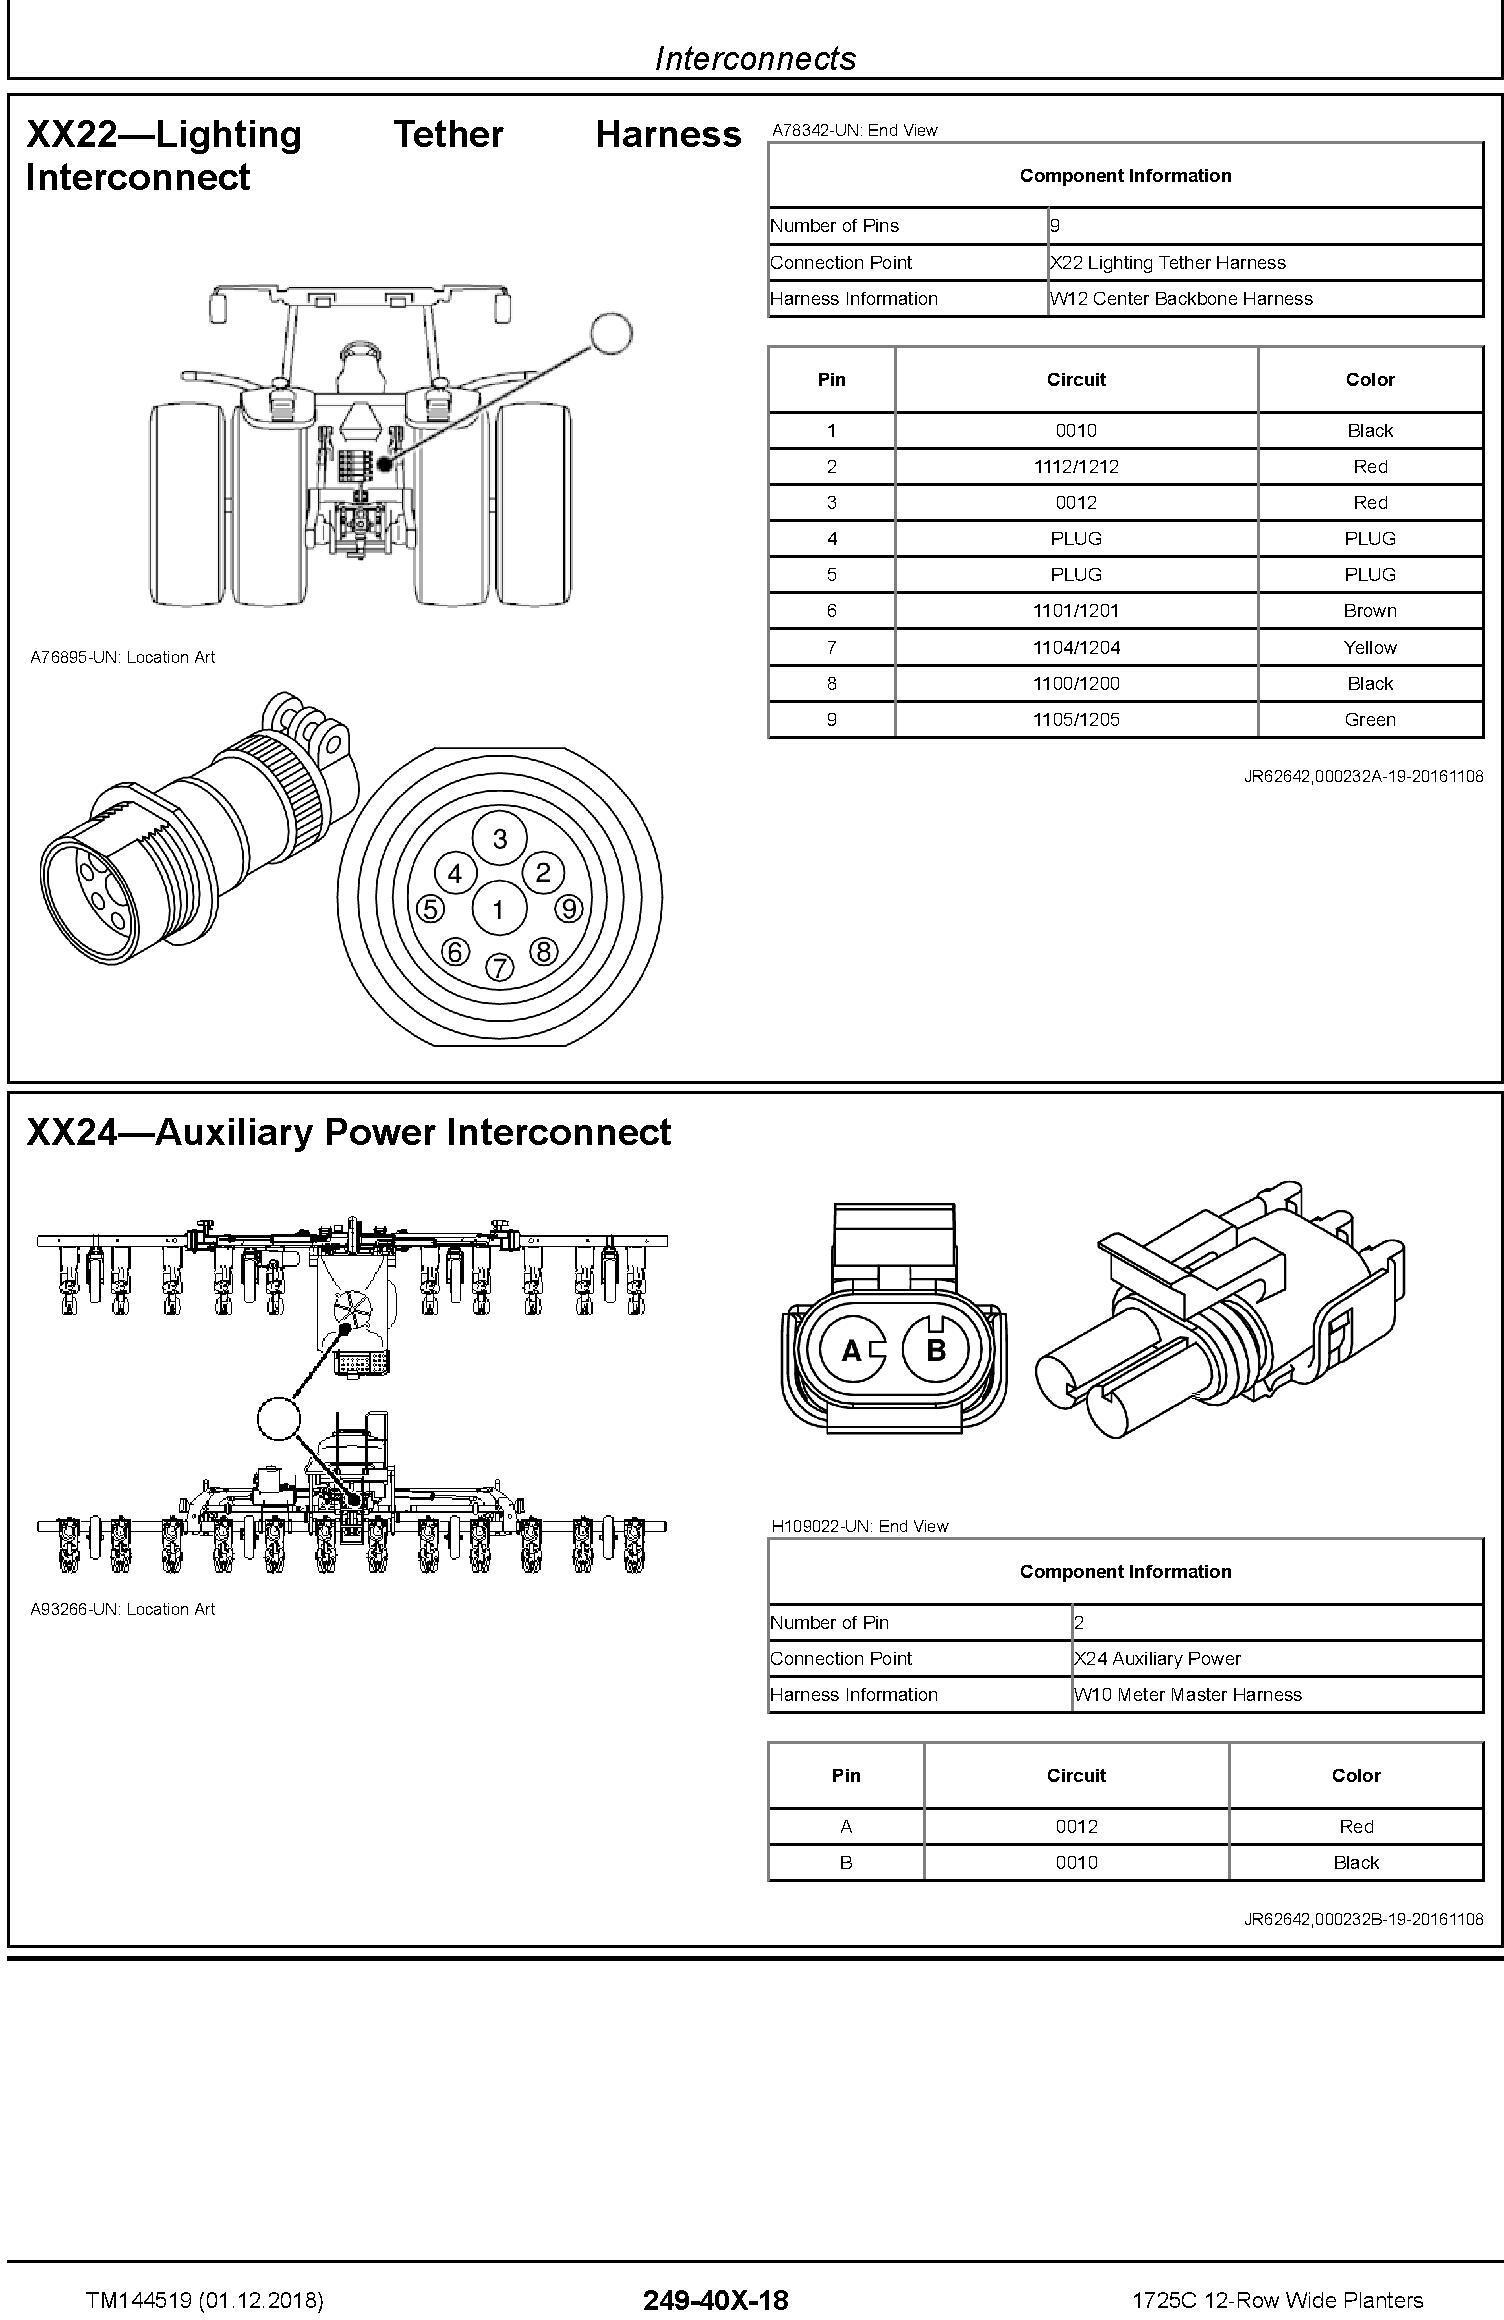 John Deere 1725C 12-Row Wide Planters Diagnostic Technical Service Manual (TM144519) - 2